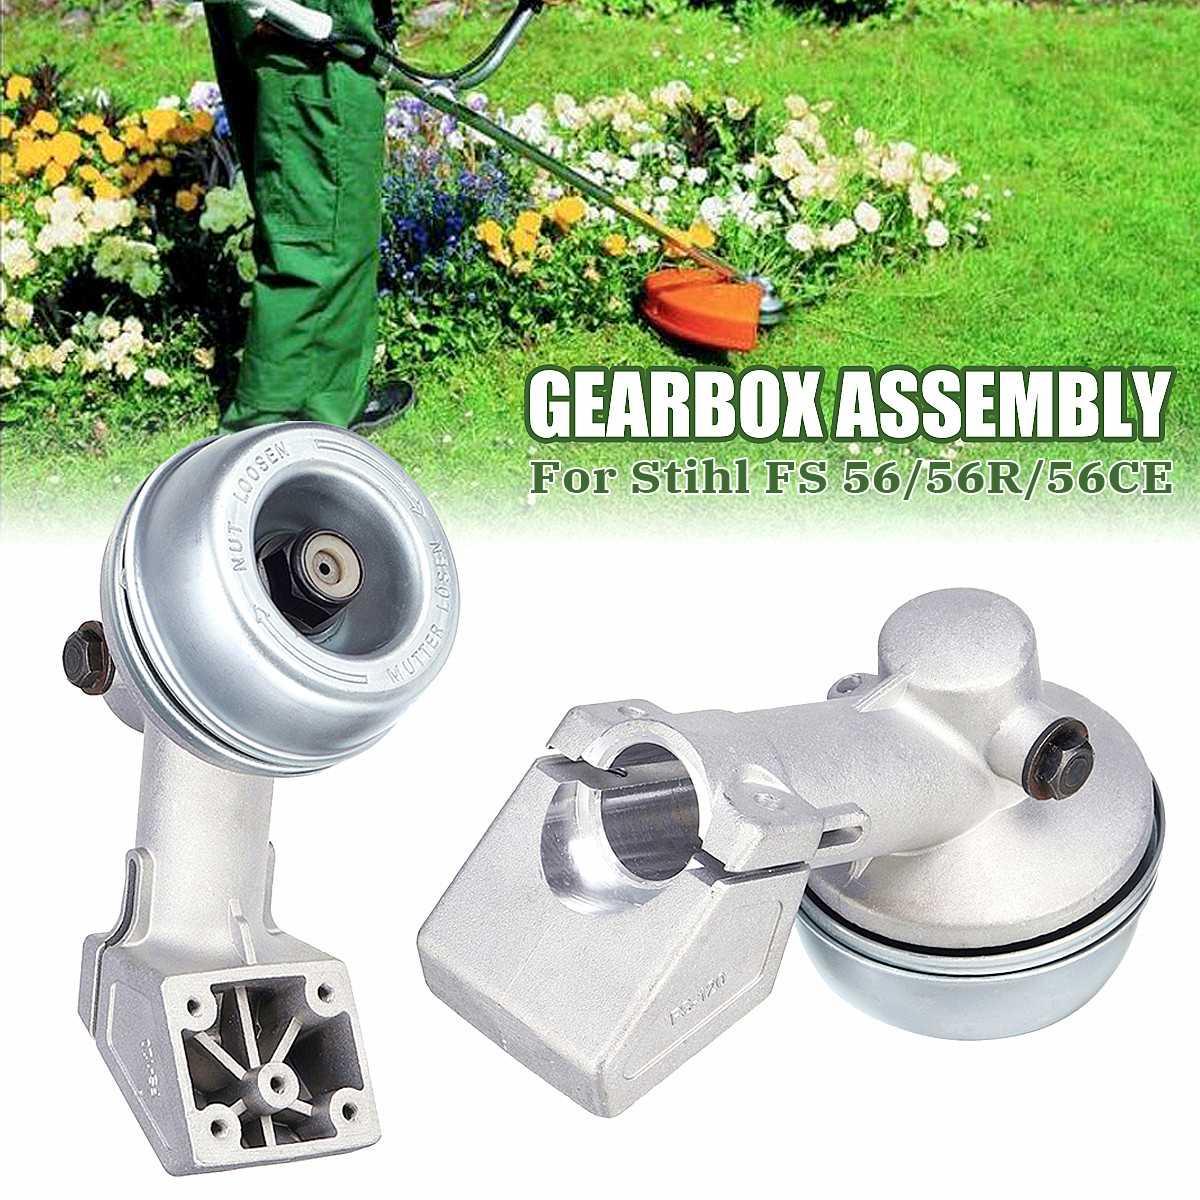 1Pcs 75x155mm Trimmer Gearbox Working Head Lawn mower gear box head Garden Tools Accessories For Stihl FS 56 56R 56CE